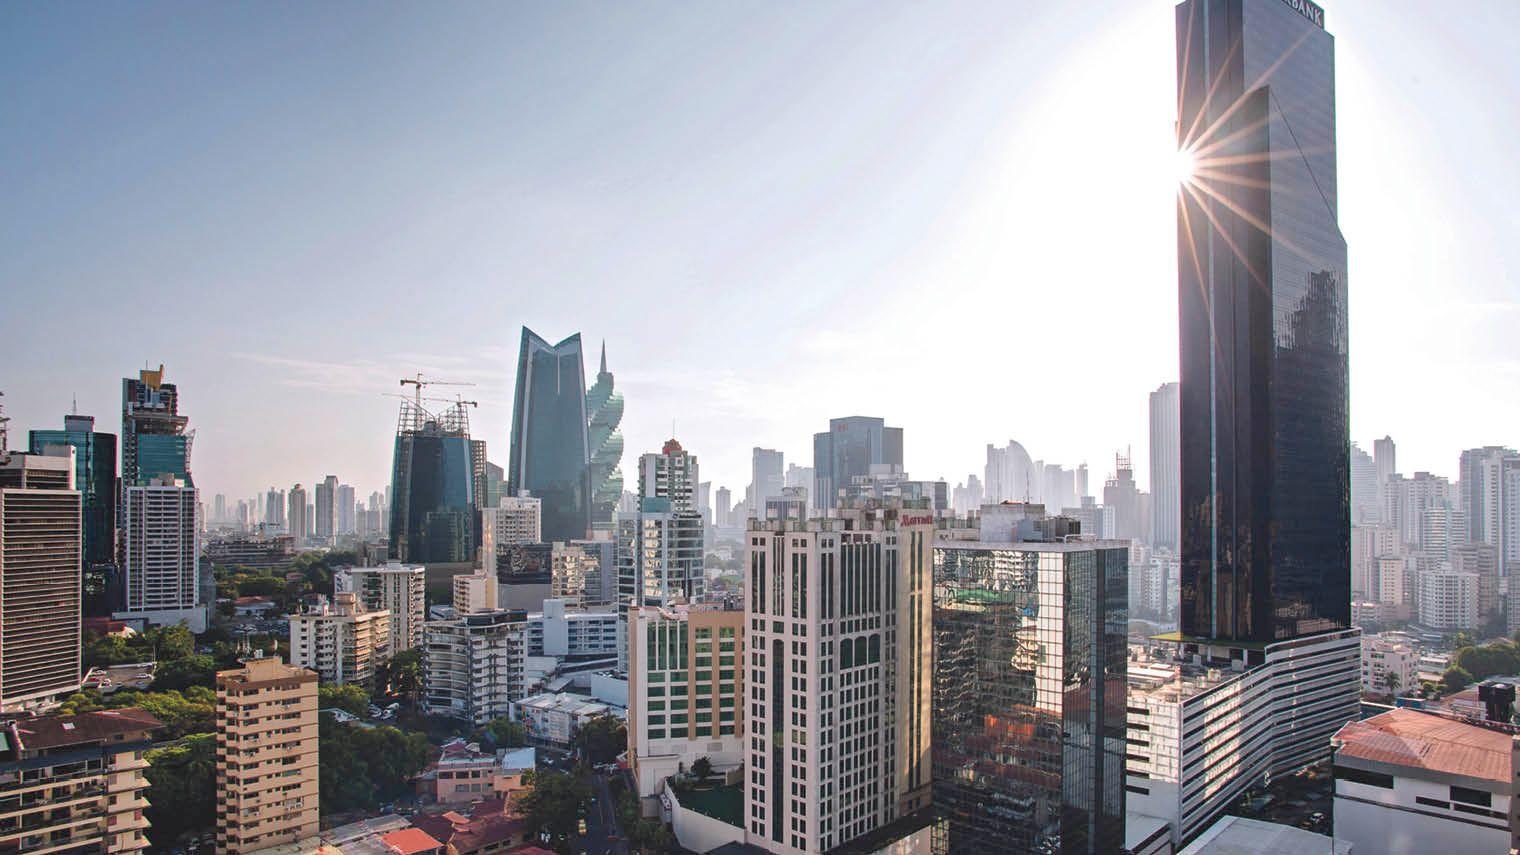 Latin America's 'first smart city' arrives Smart city